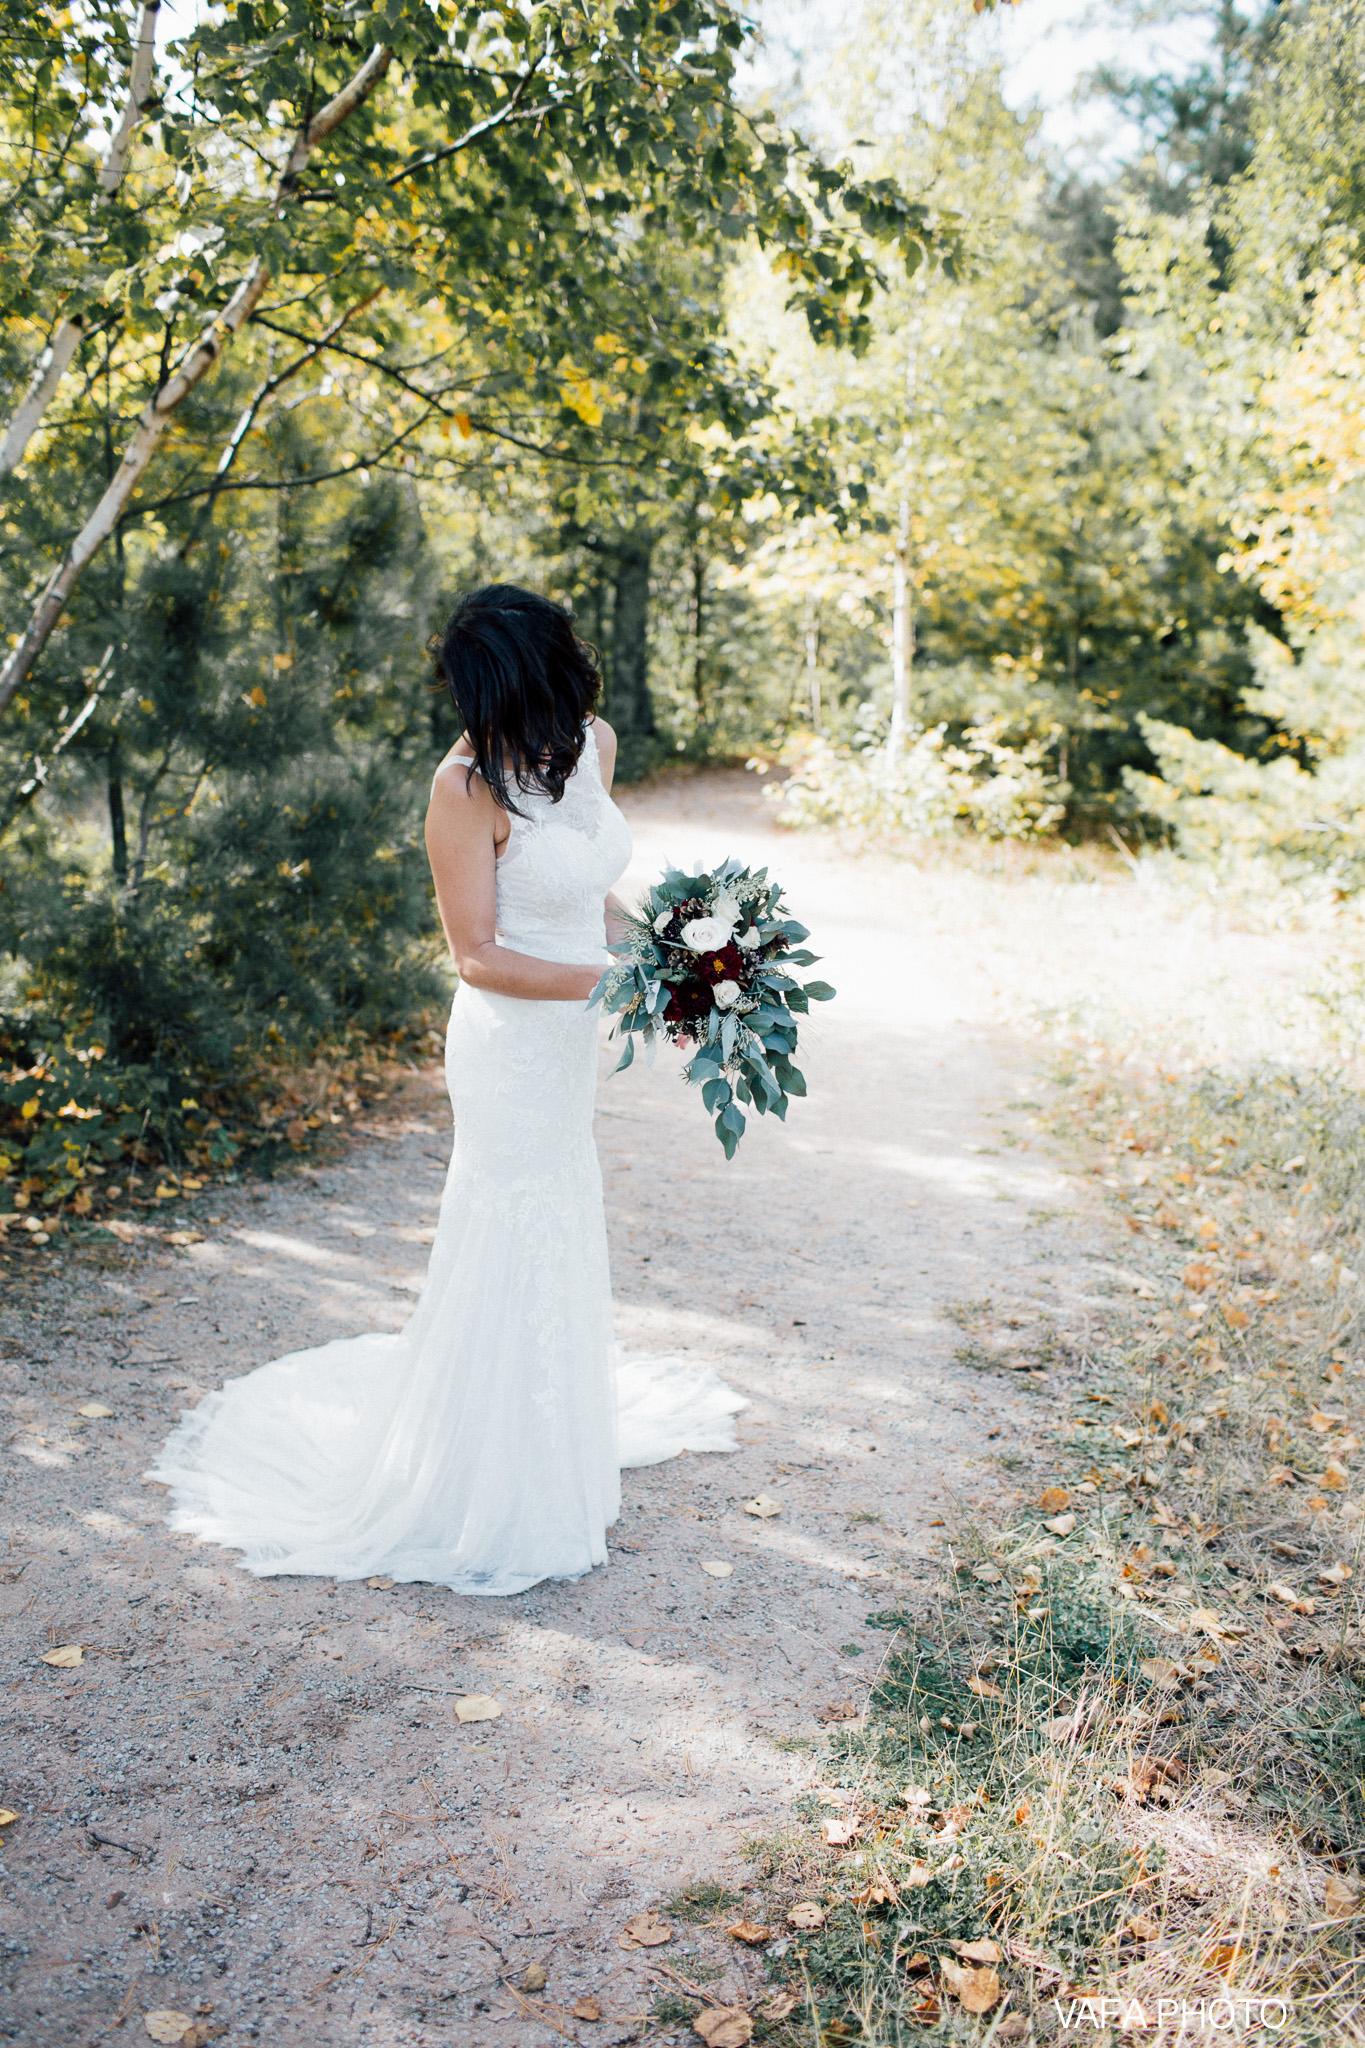 Hogback-Mountain-Wedding-Chelsea-Josh-Vafa-Photo-597.jpg